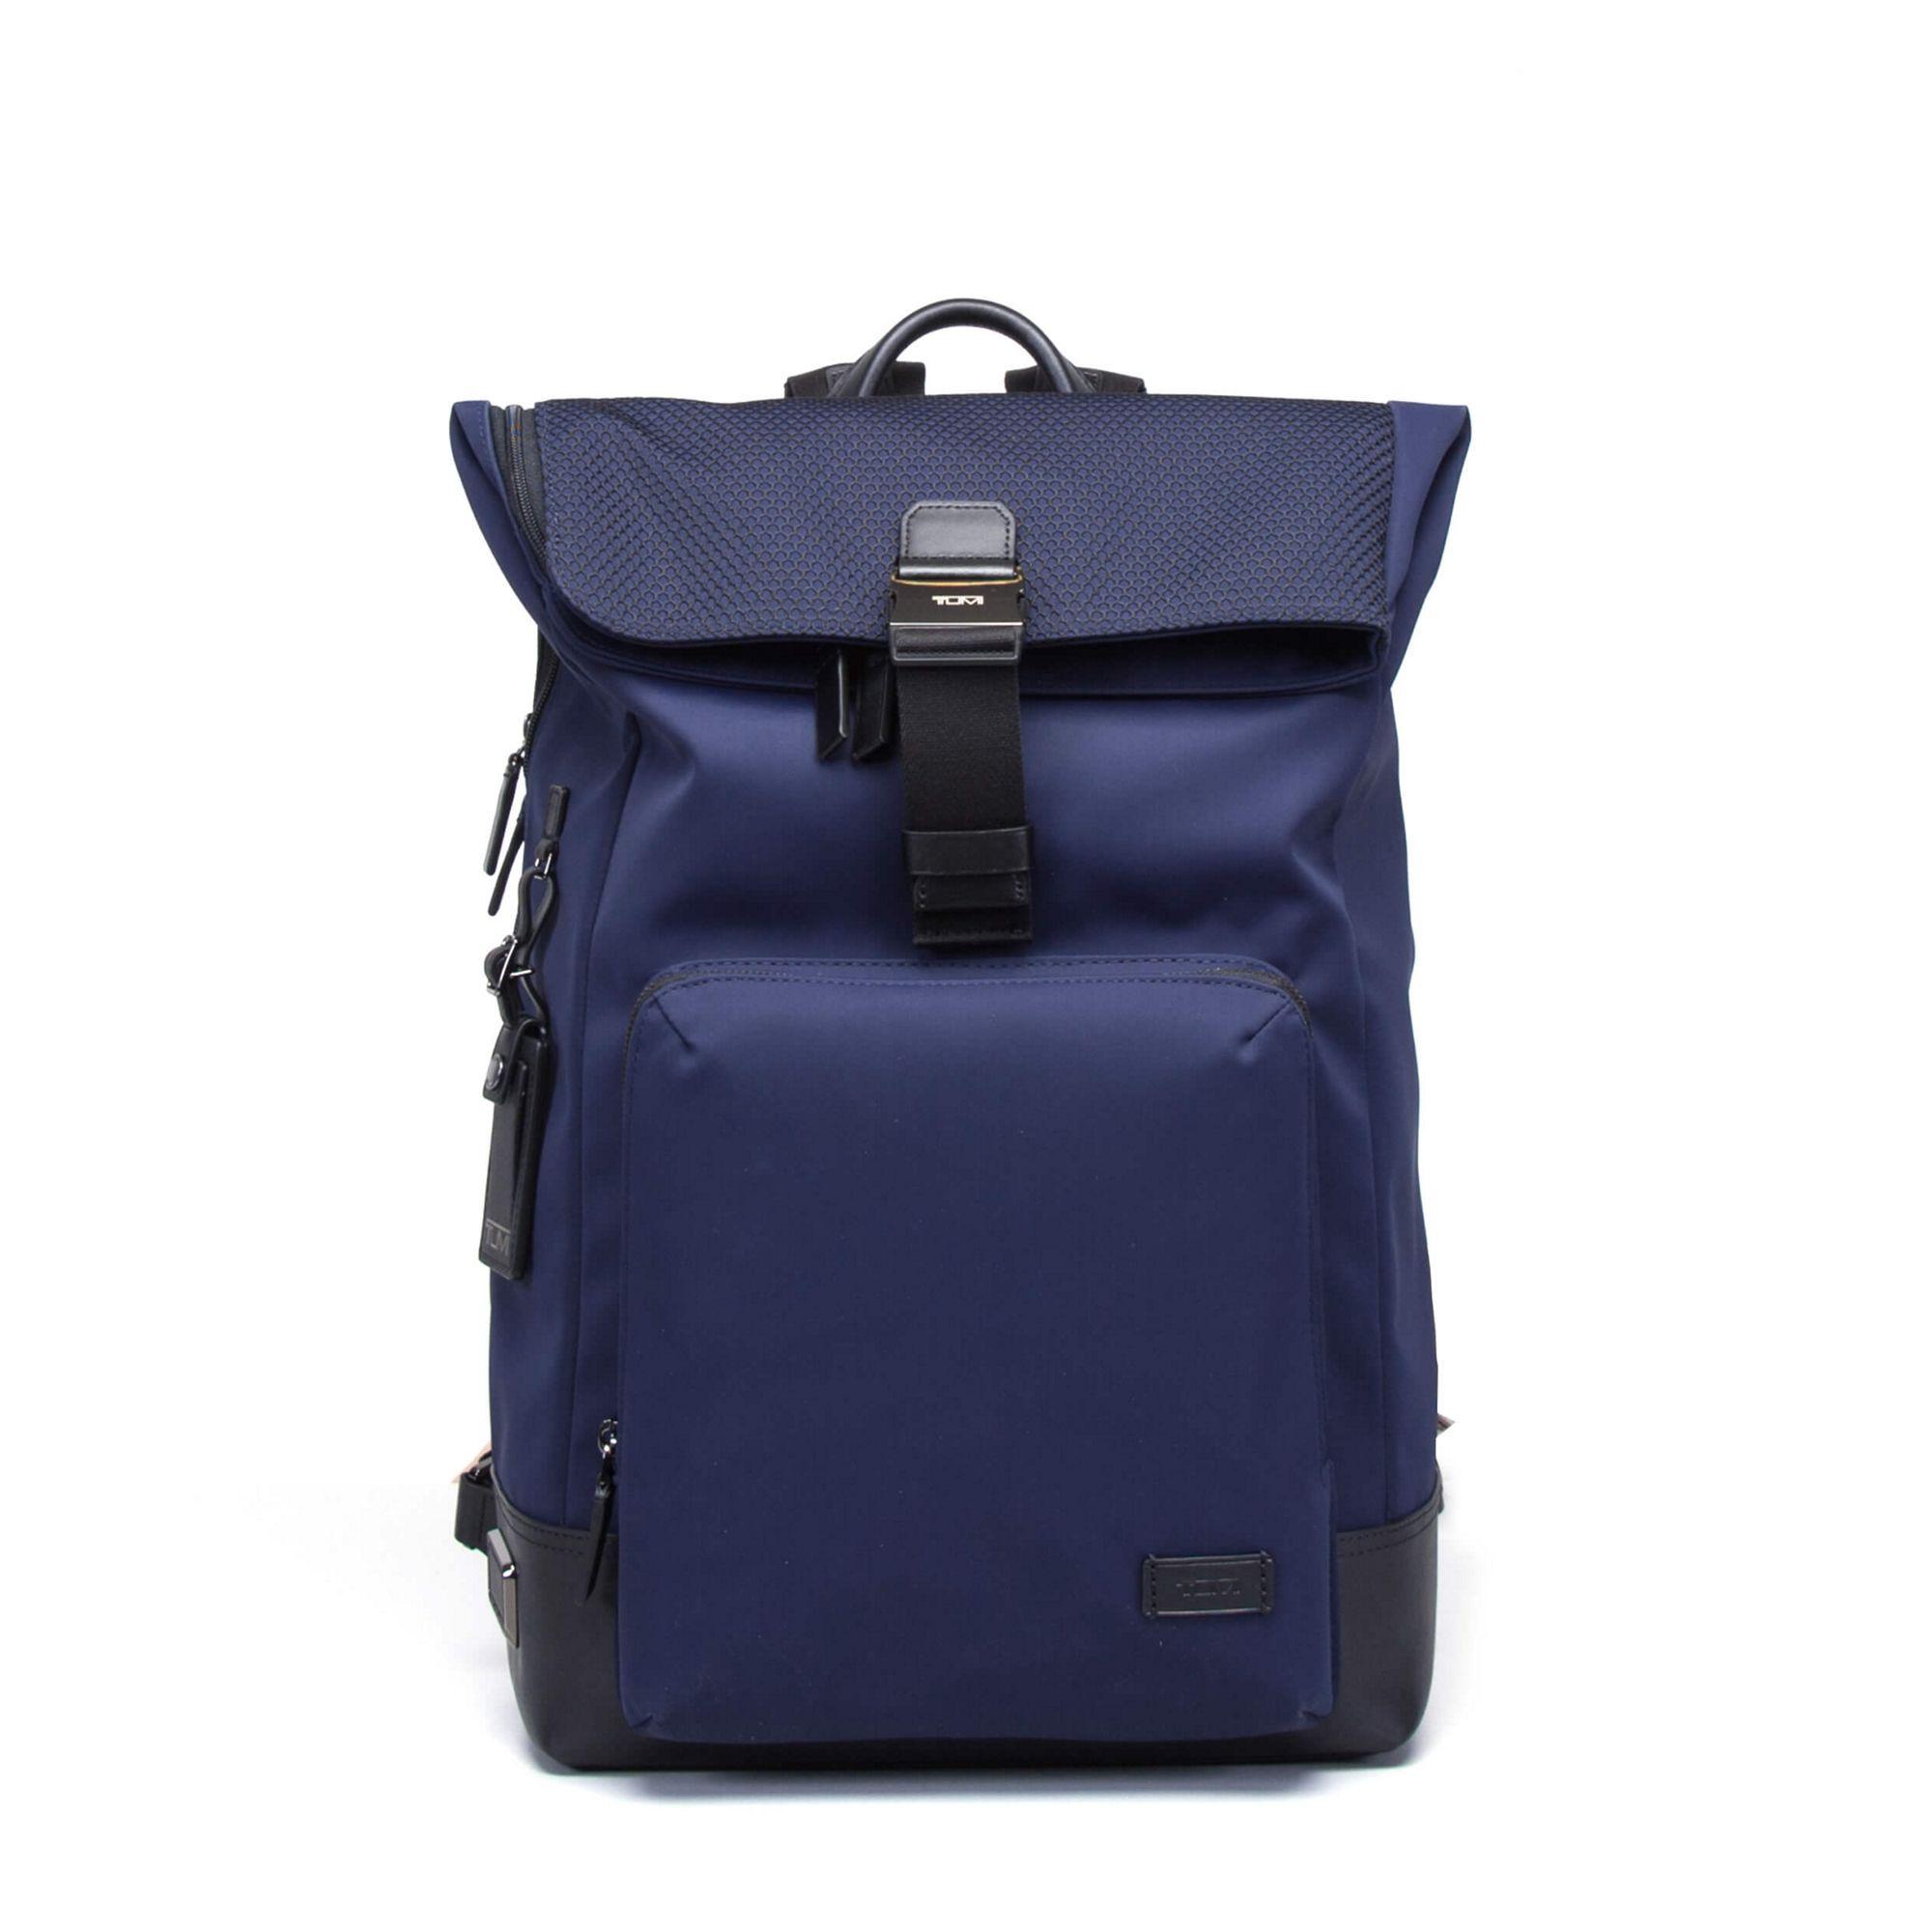 Backpack Harrison Roll 117293 Oak Top Tumi OkXuiPZ